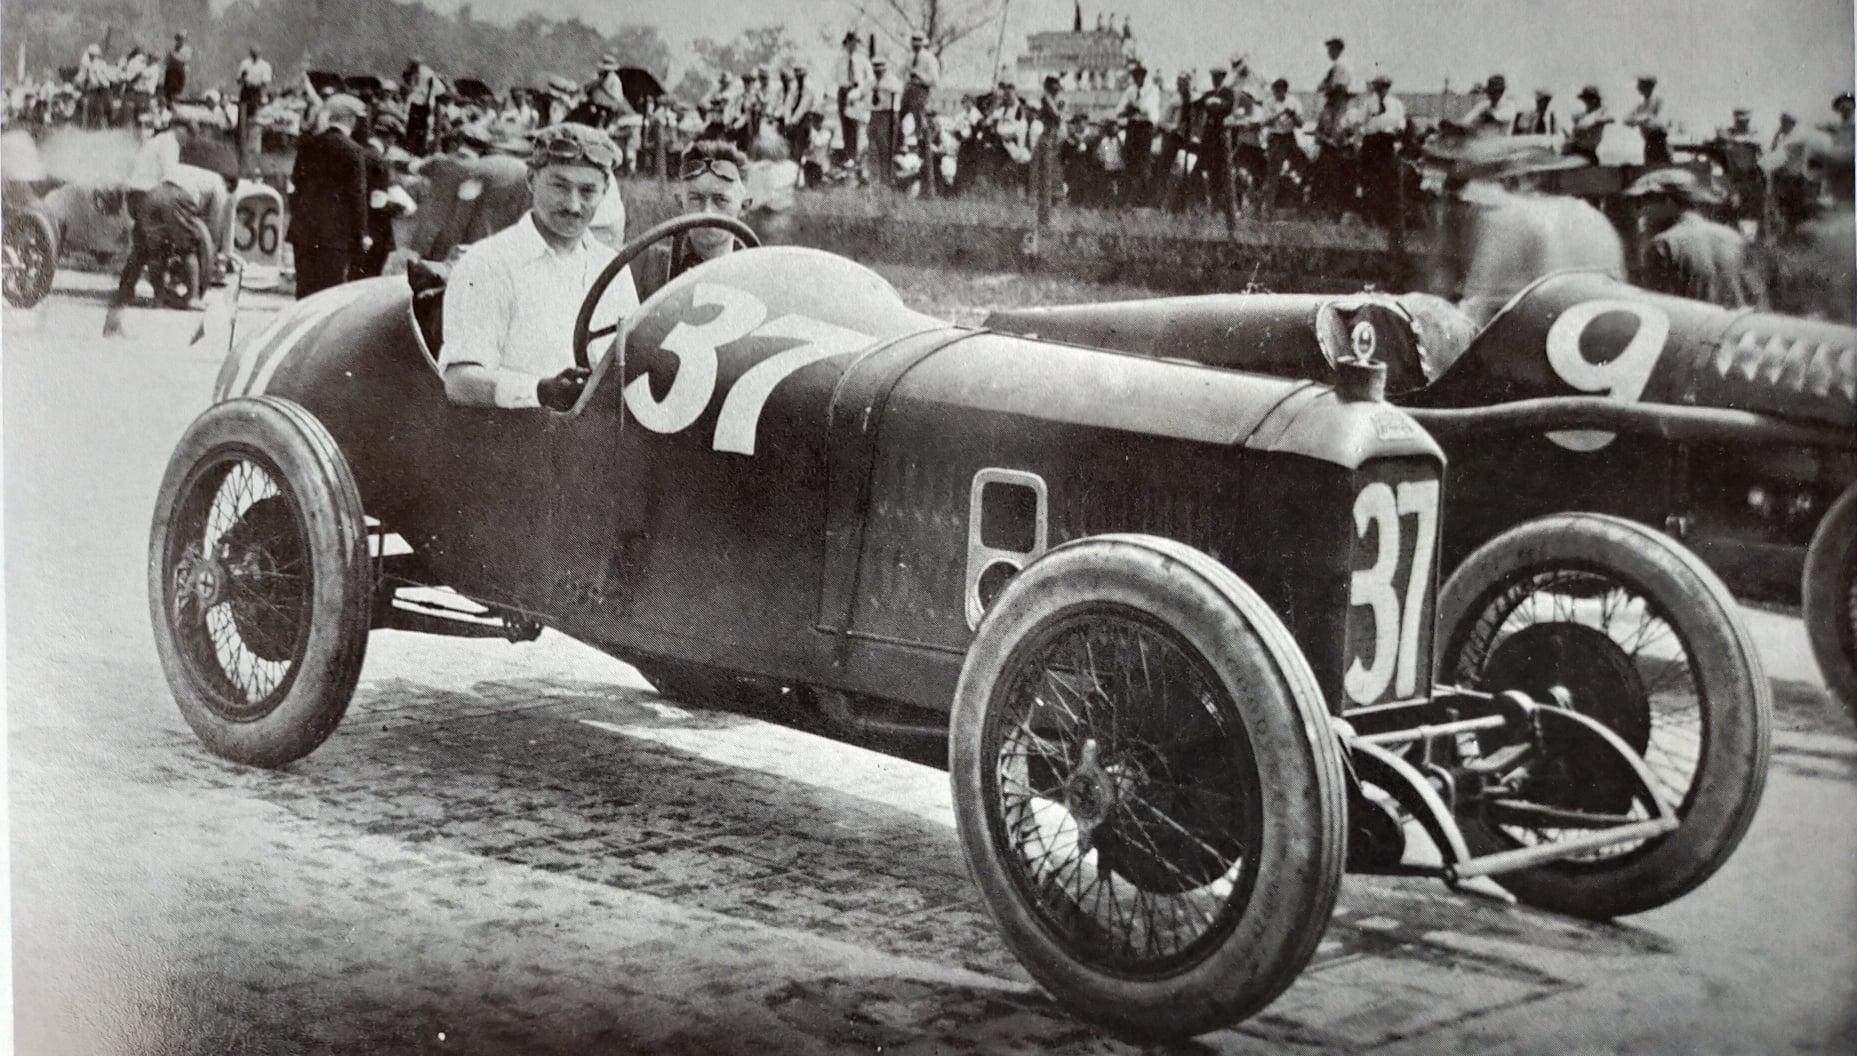 Peugeot-4-5-L-1914